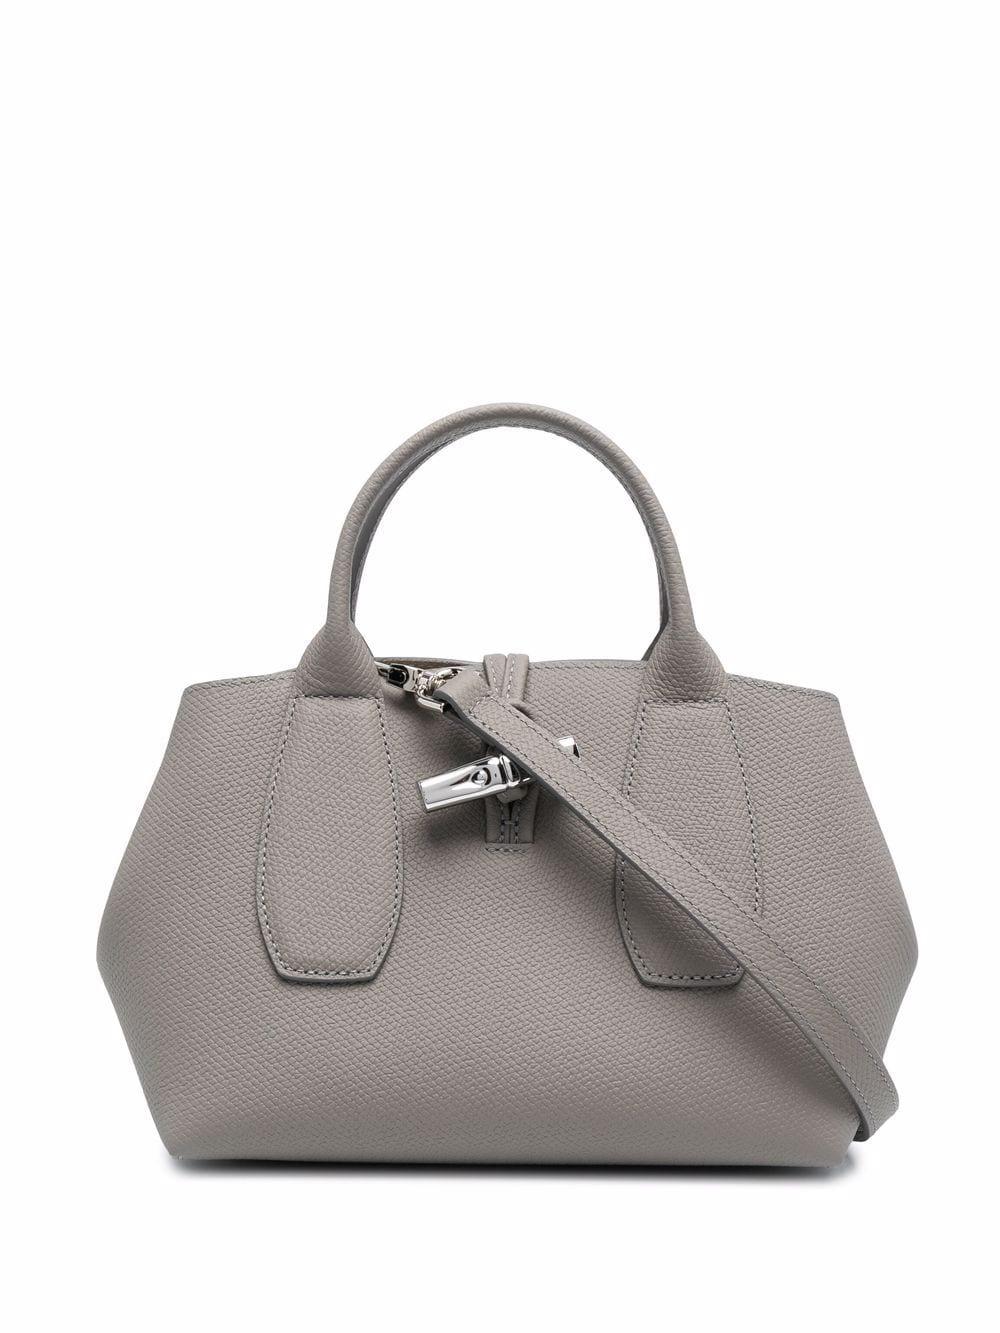 Longchamp Roseau Handtasche - Grau